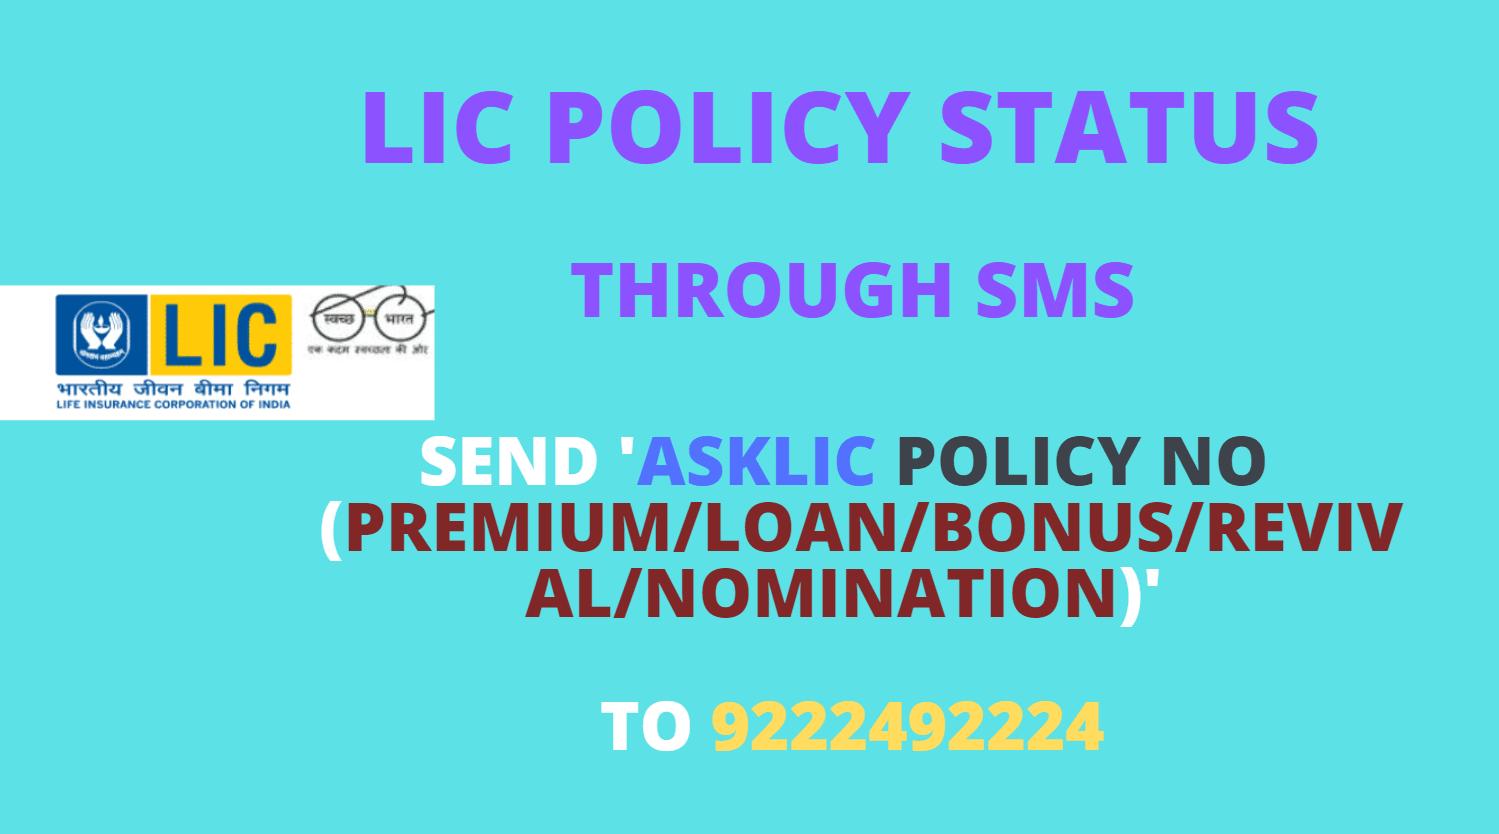 lic policy status through sms